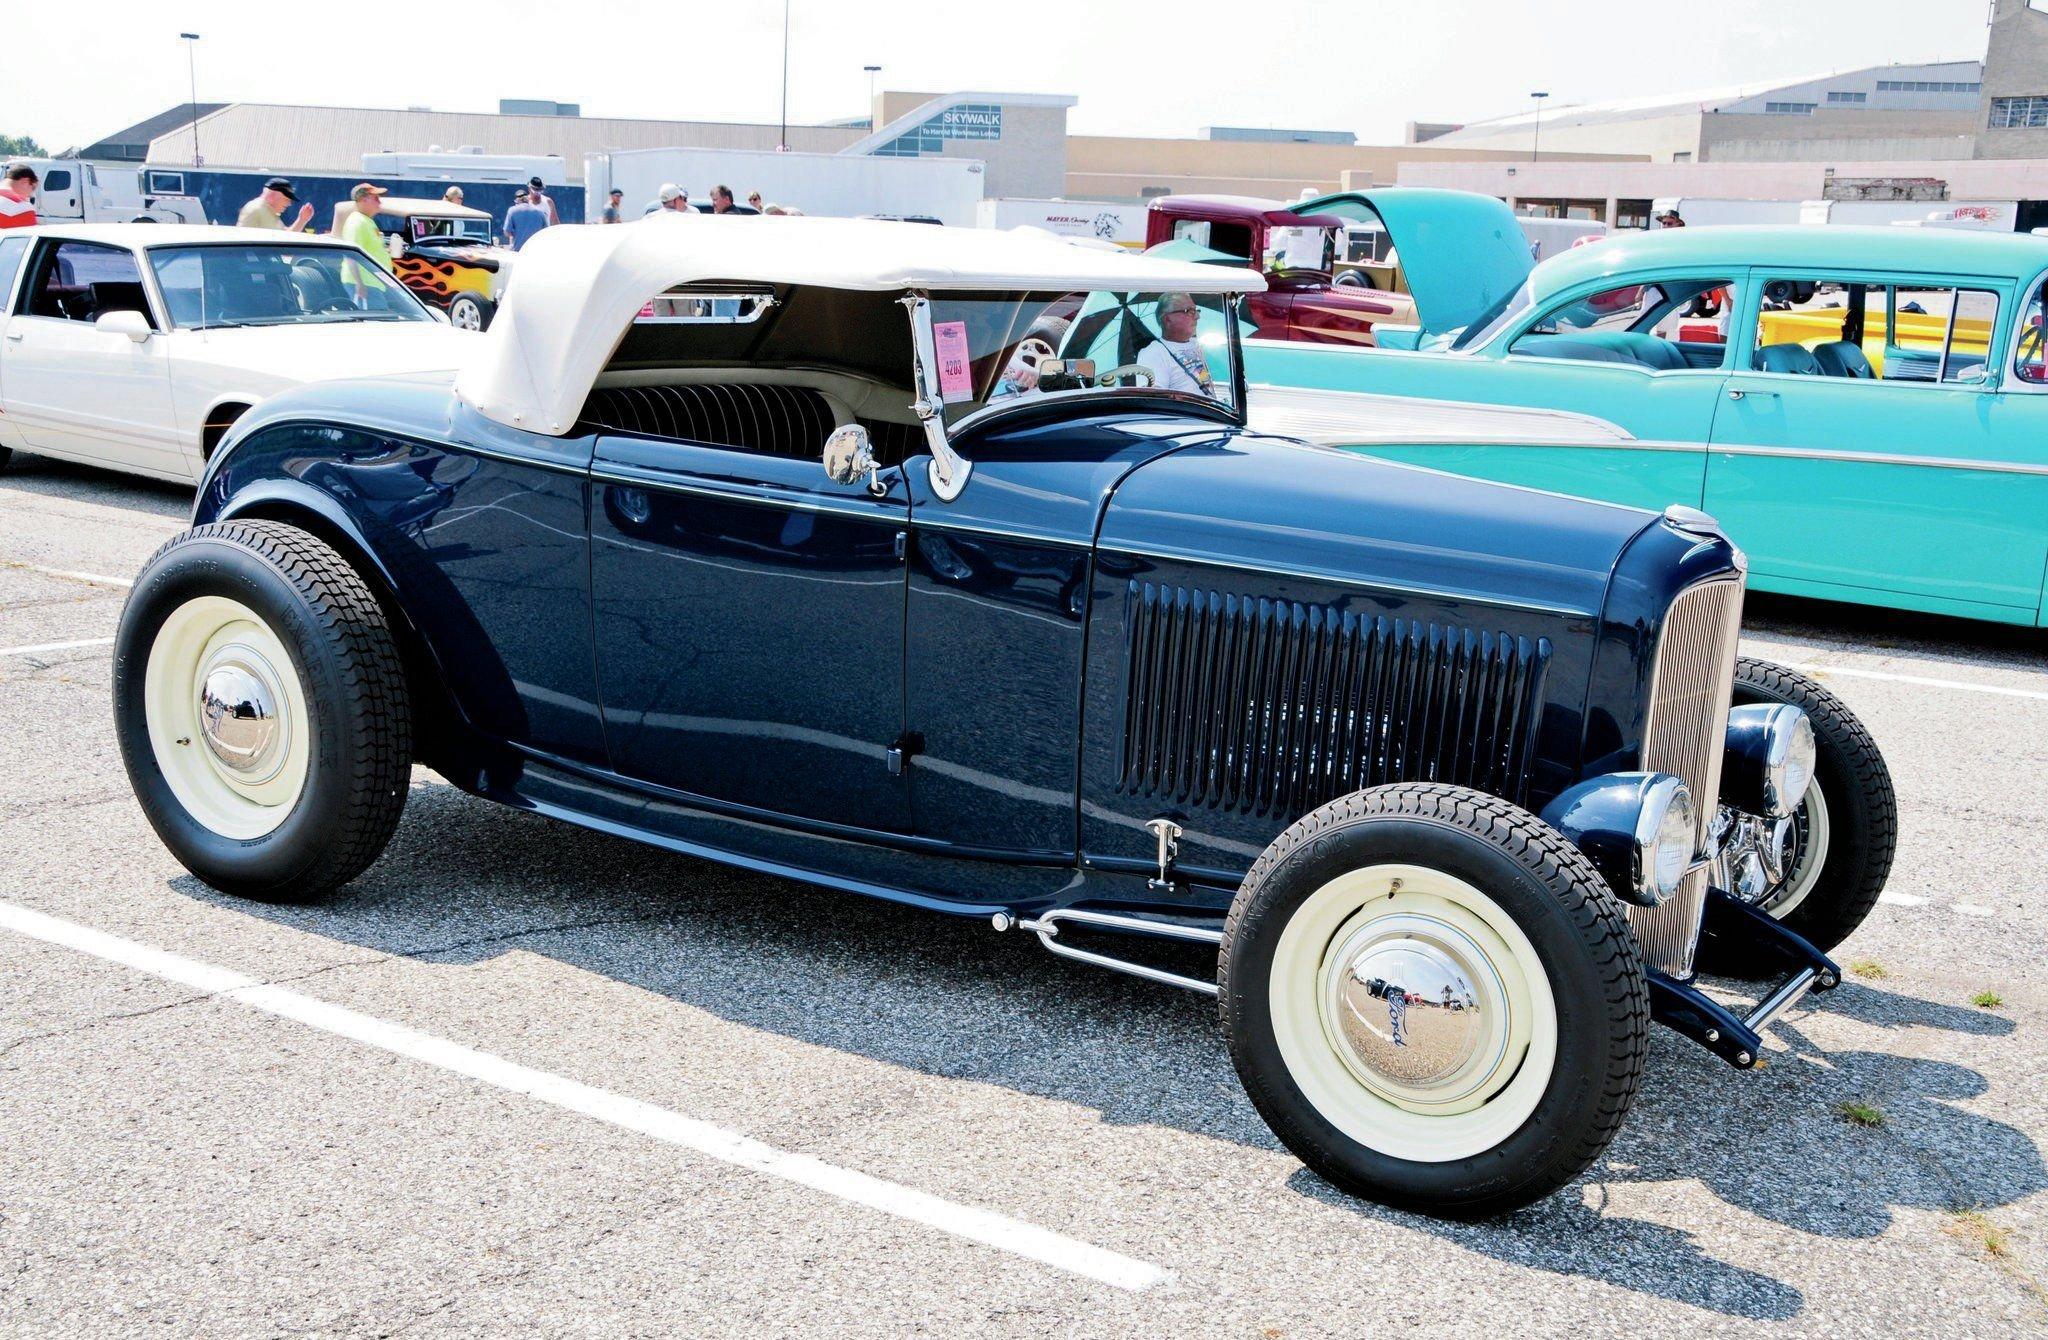 1932 Ford Roadster-07 wallpaper